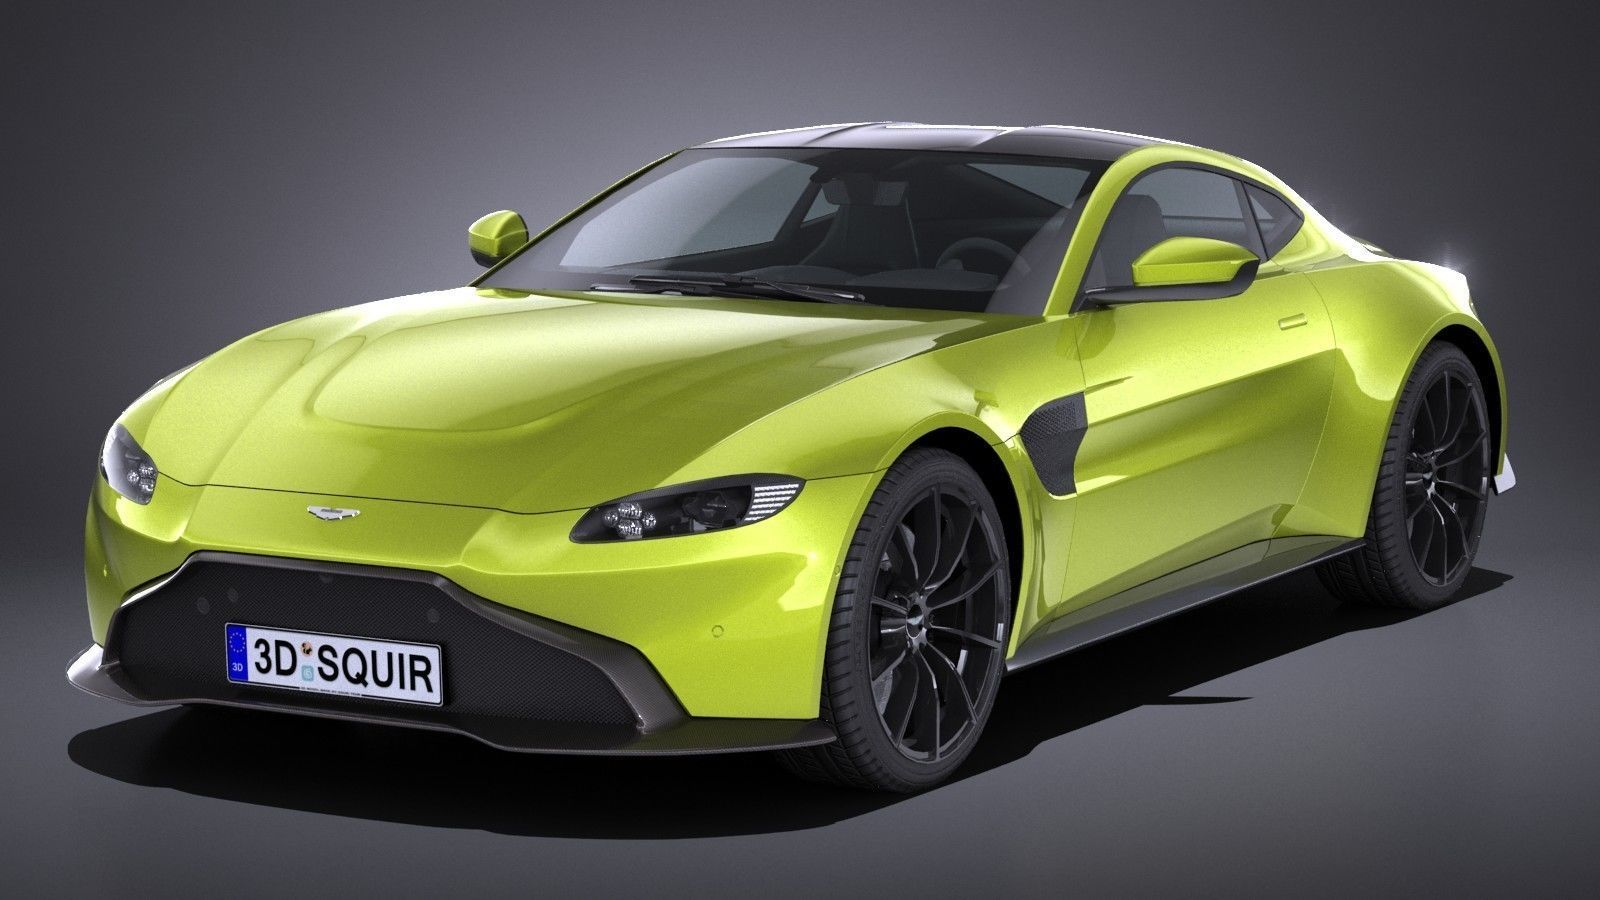 LowPoly Aston Martin Vantage 2019